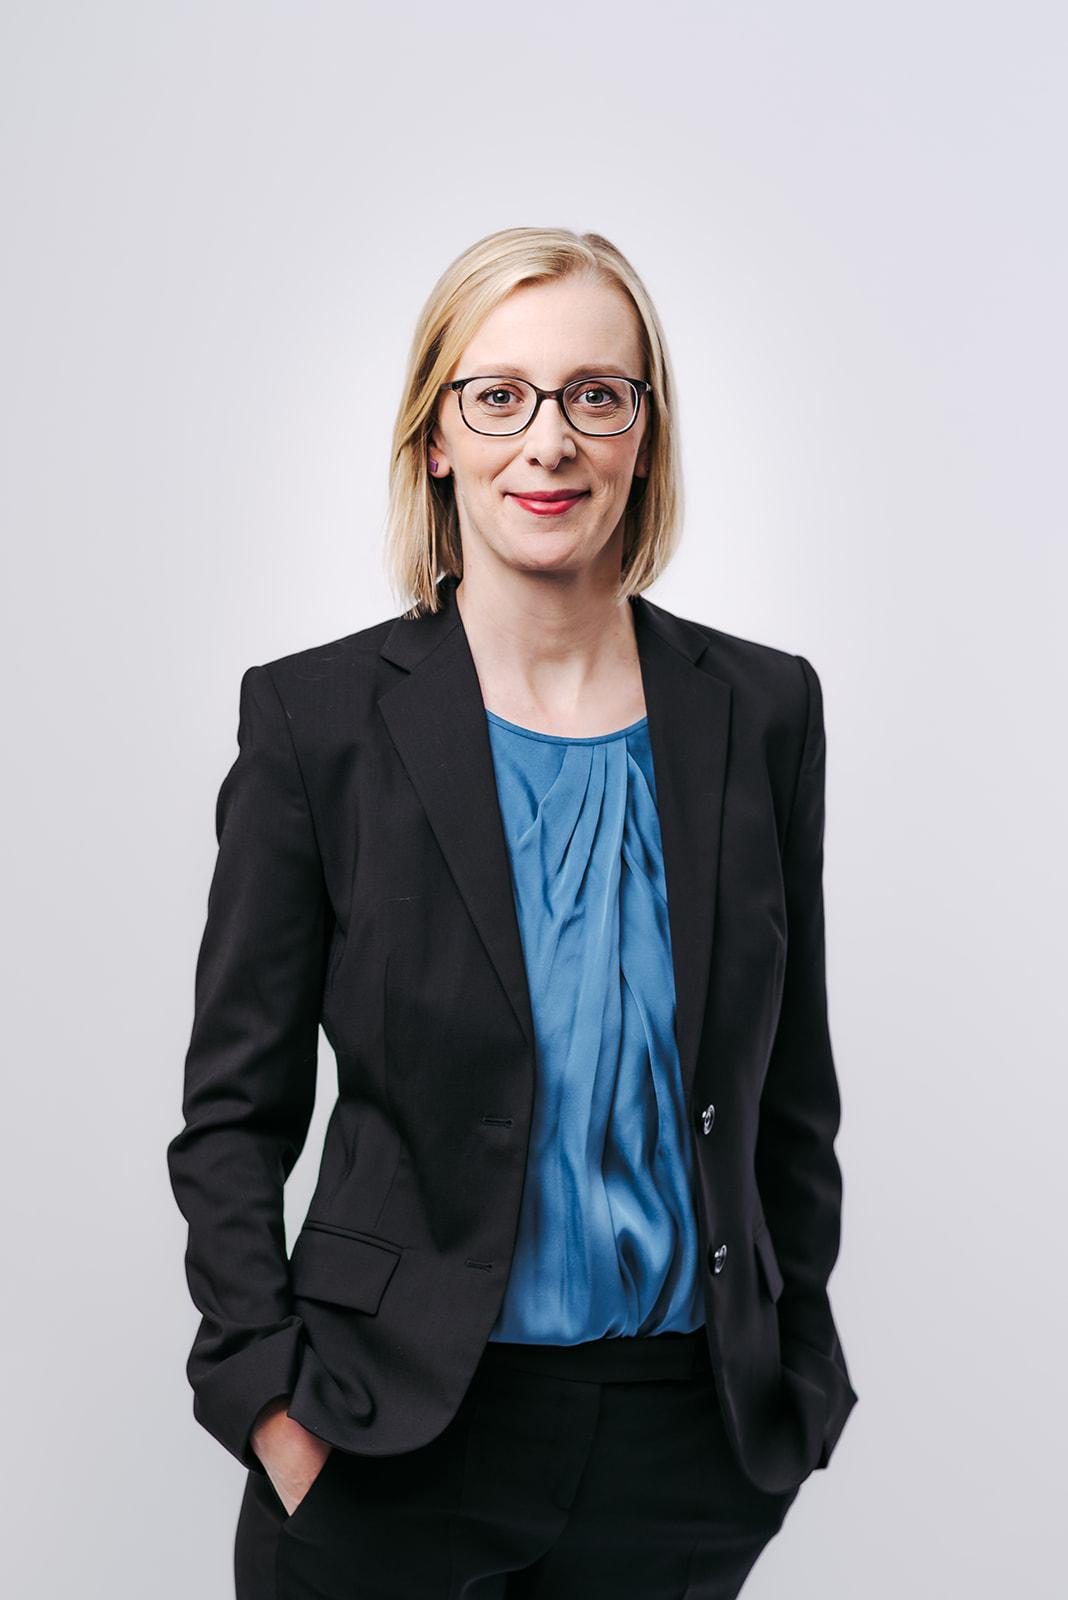 Dr. Diana Ettig Spirit Legal